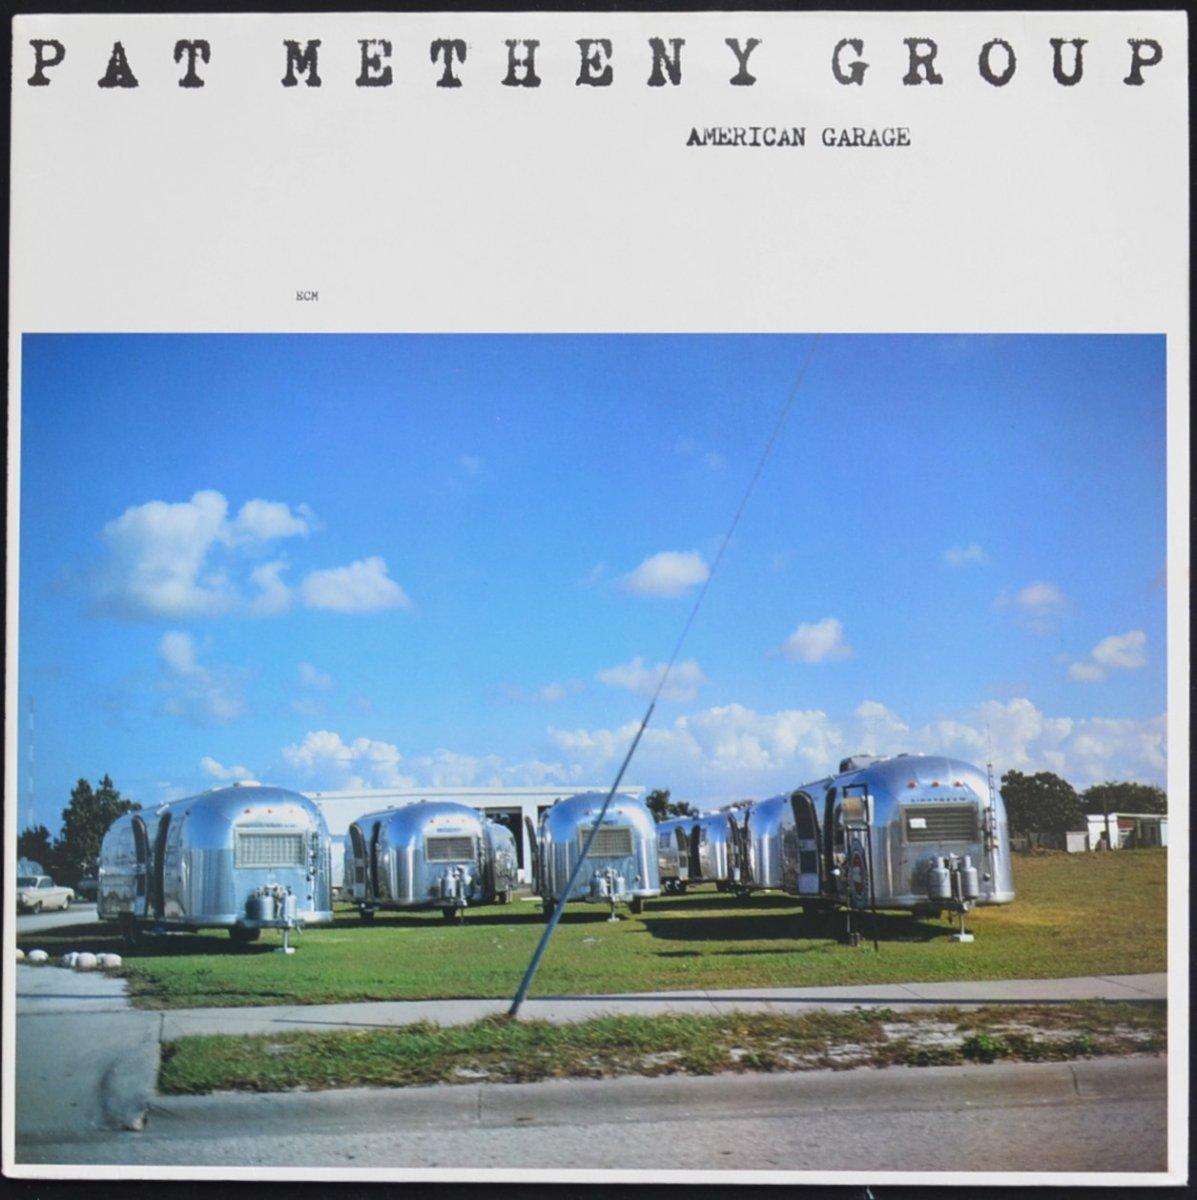 PAT METHENY GROUP / AMERICAN GARAGE (LP)